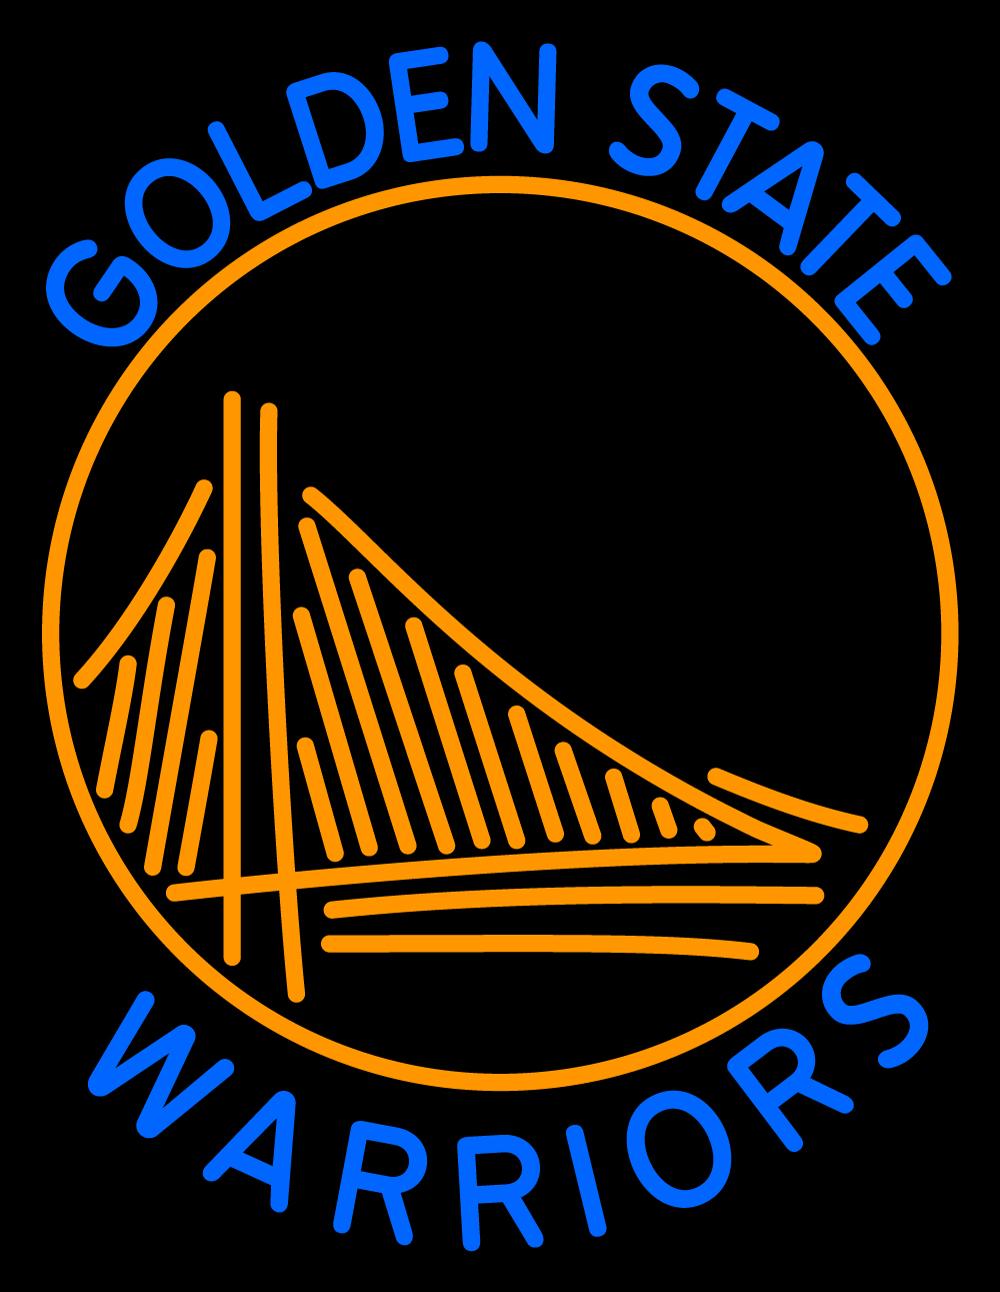 Cool Golden State Warriors Wallpaper - WallpaperSafari